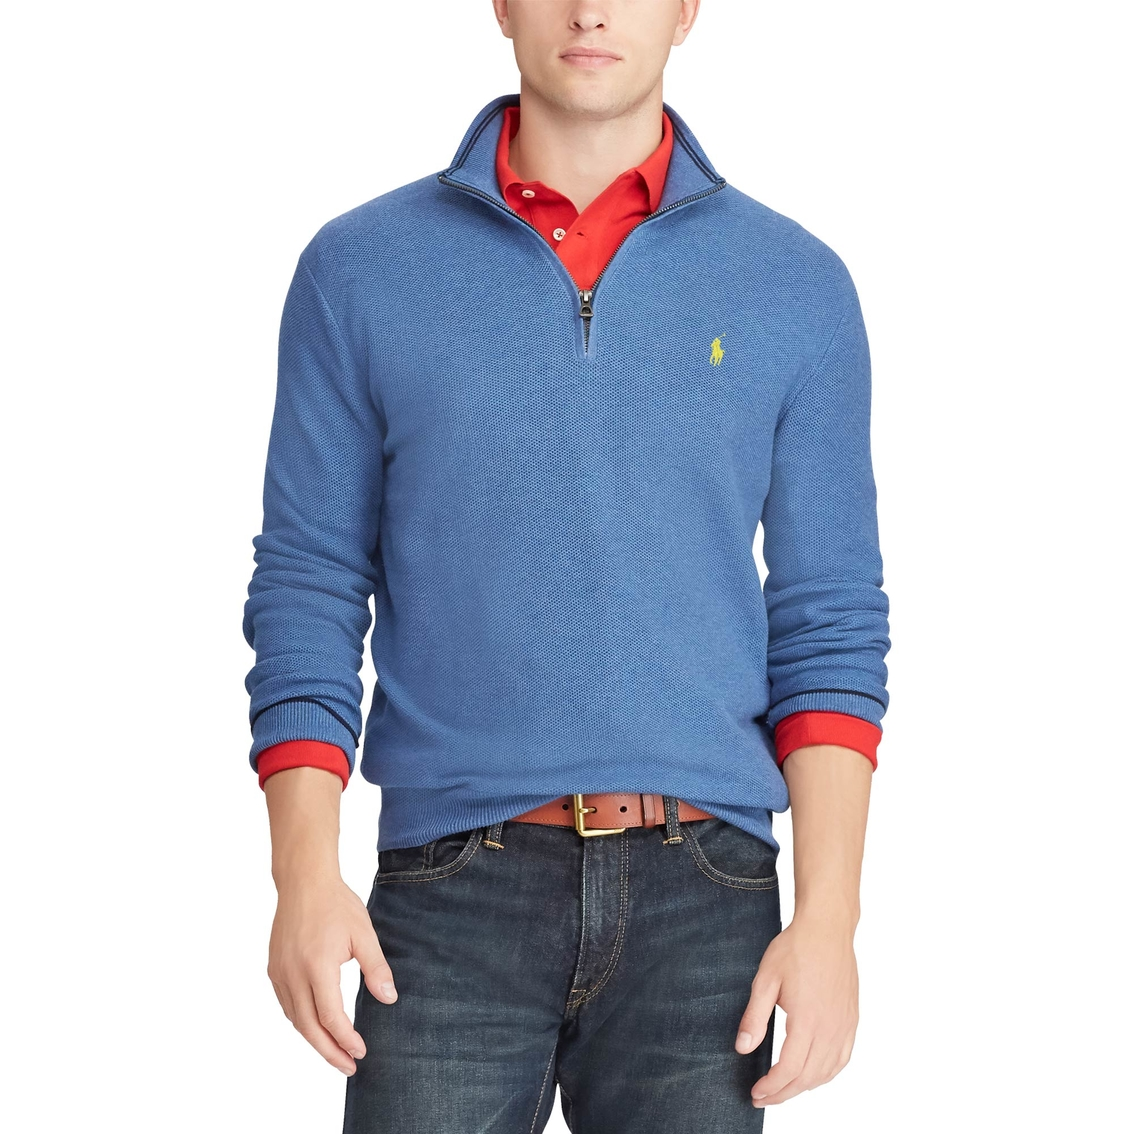 dcd81c82735f3 Polo Ralph Lauren Cotton Half-zip Sweater | Basketball | Back To ...